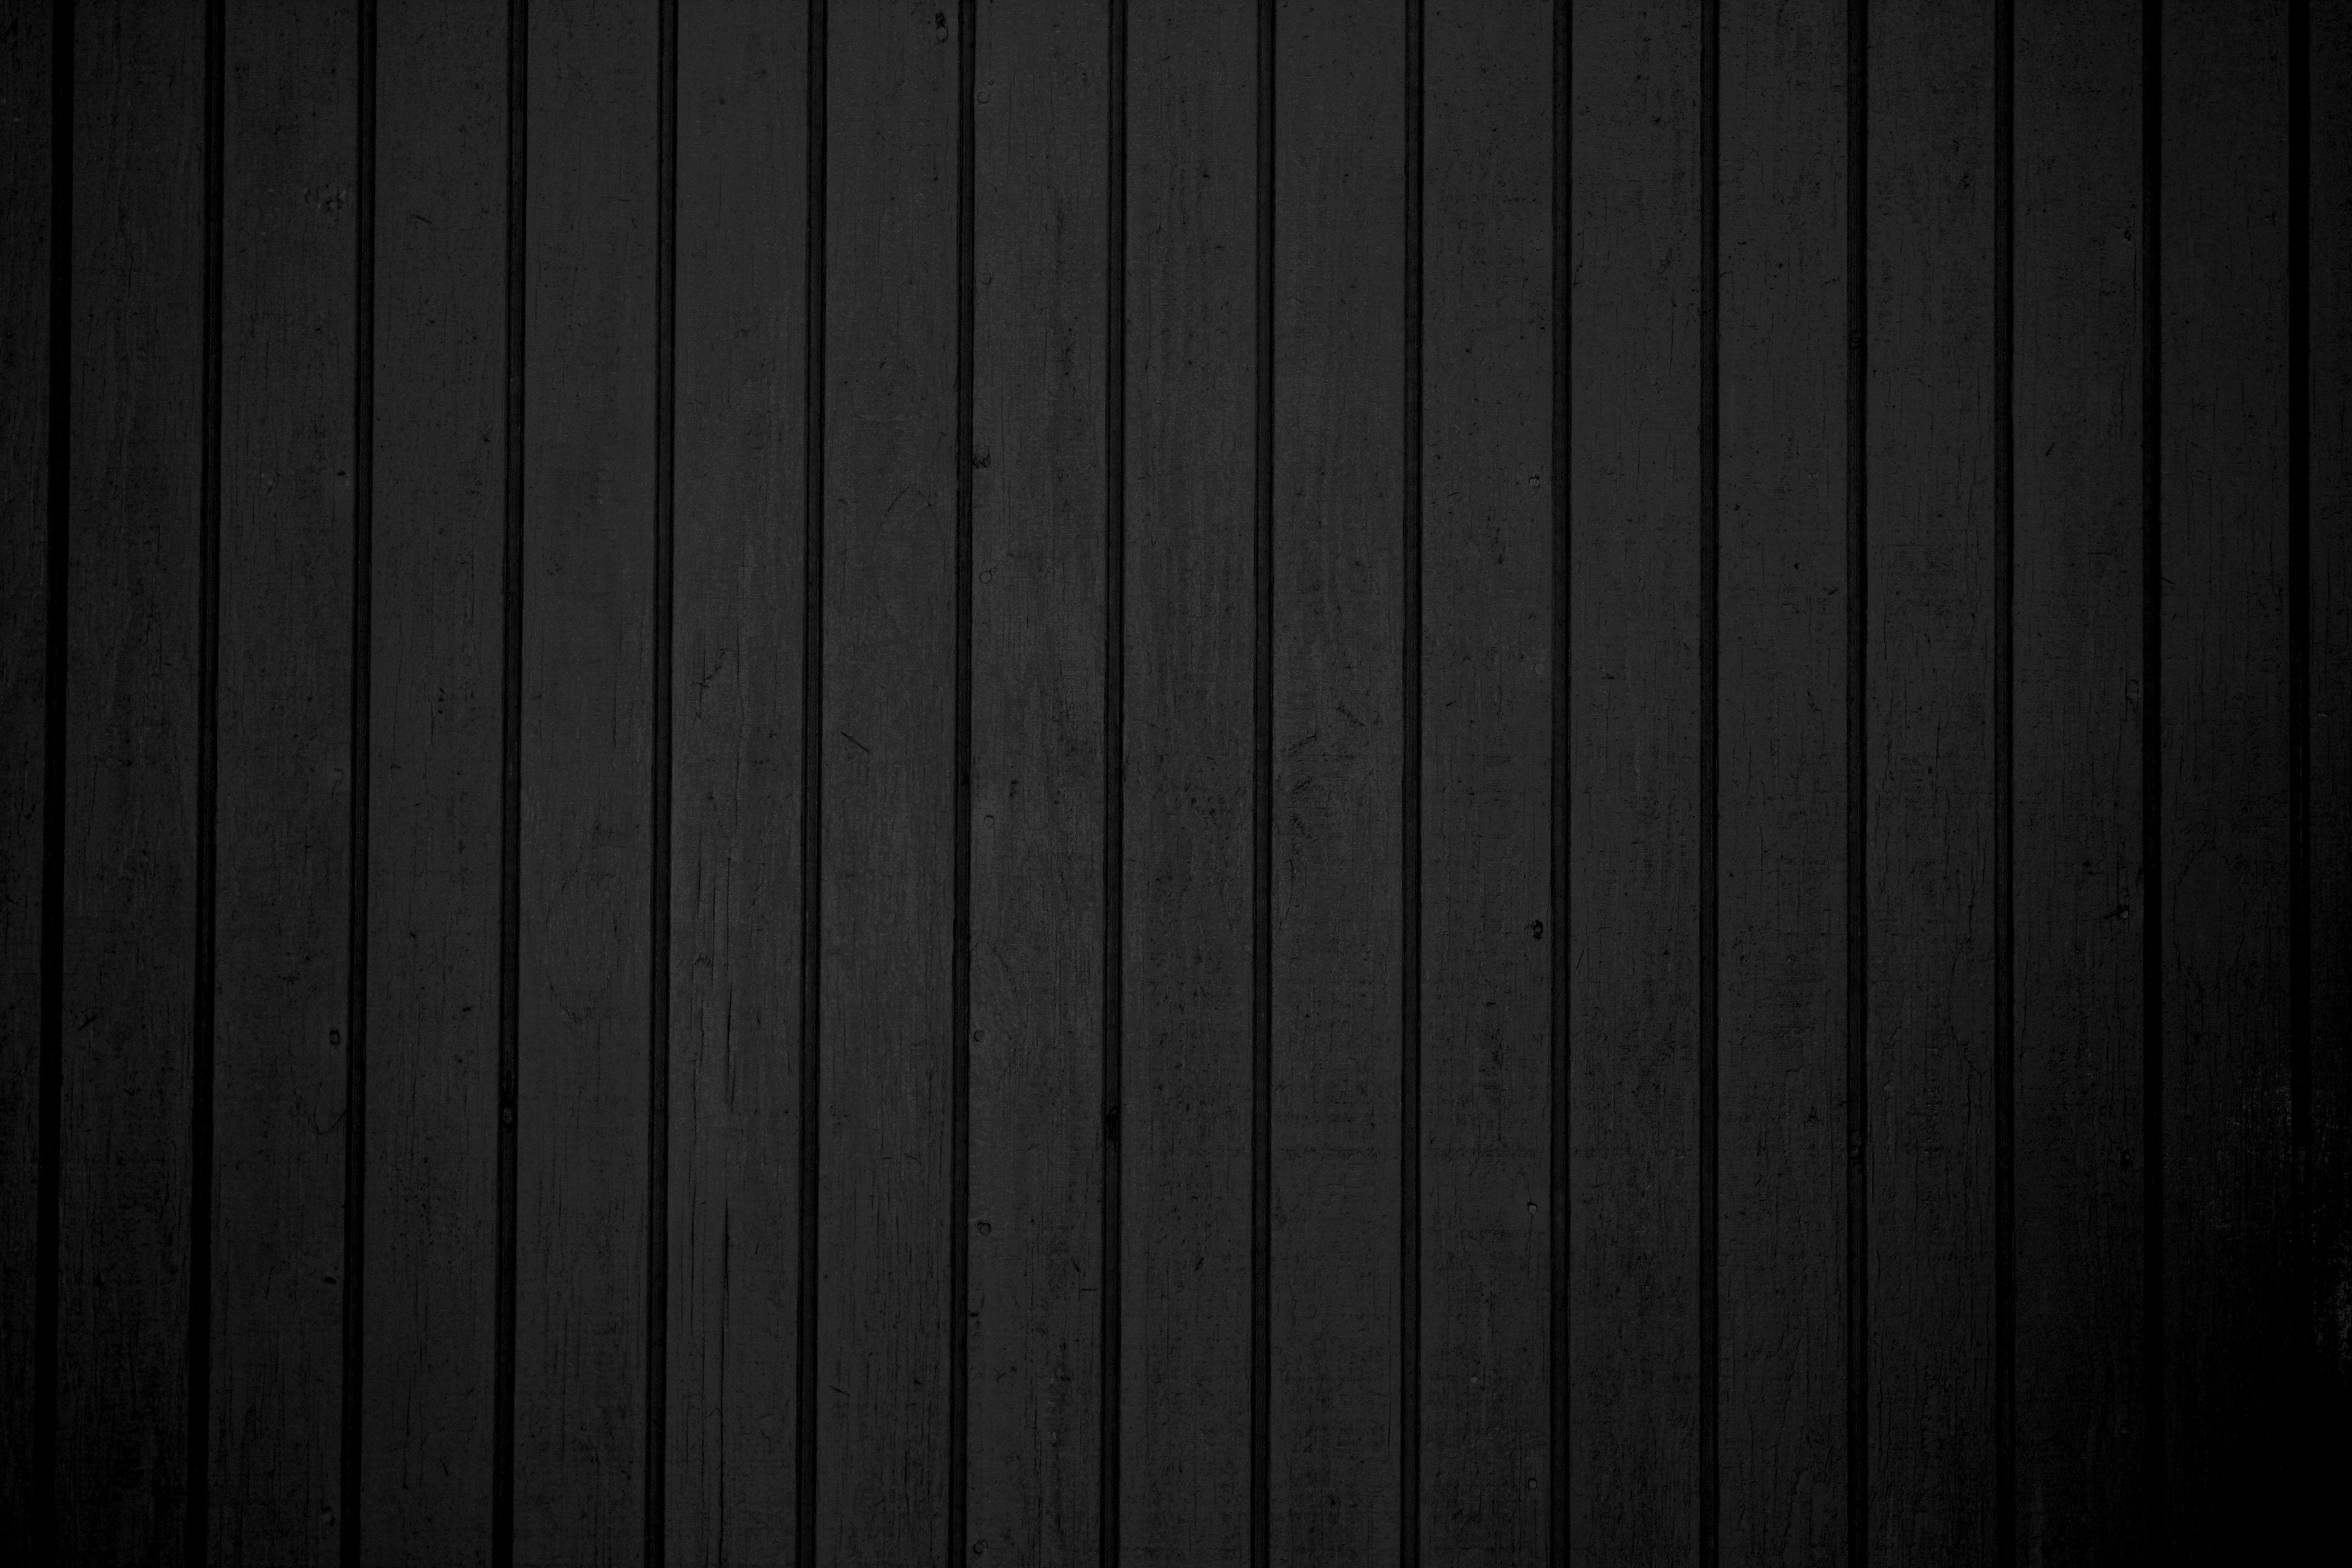 Dark Textures clipart high resolution Photos Siding Texture Panling